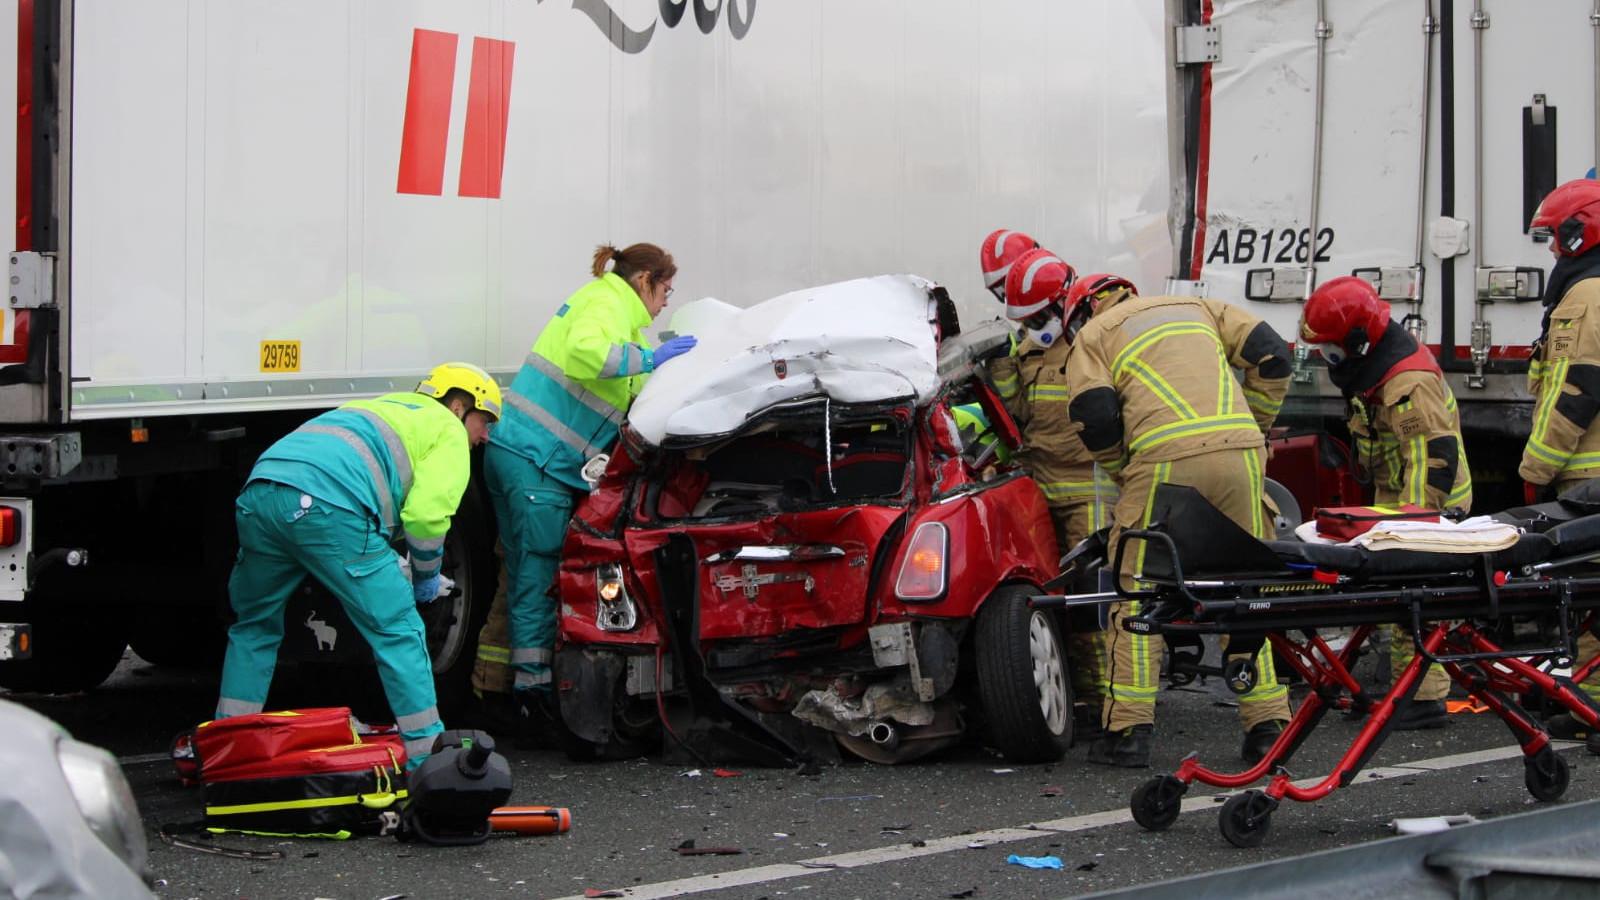 Ernstig ongeluk op A7 bij Purmerend: snelweg richting Zaanstad dicht.